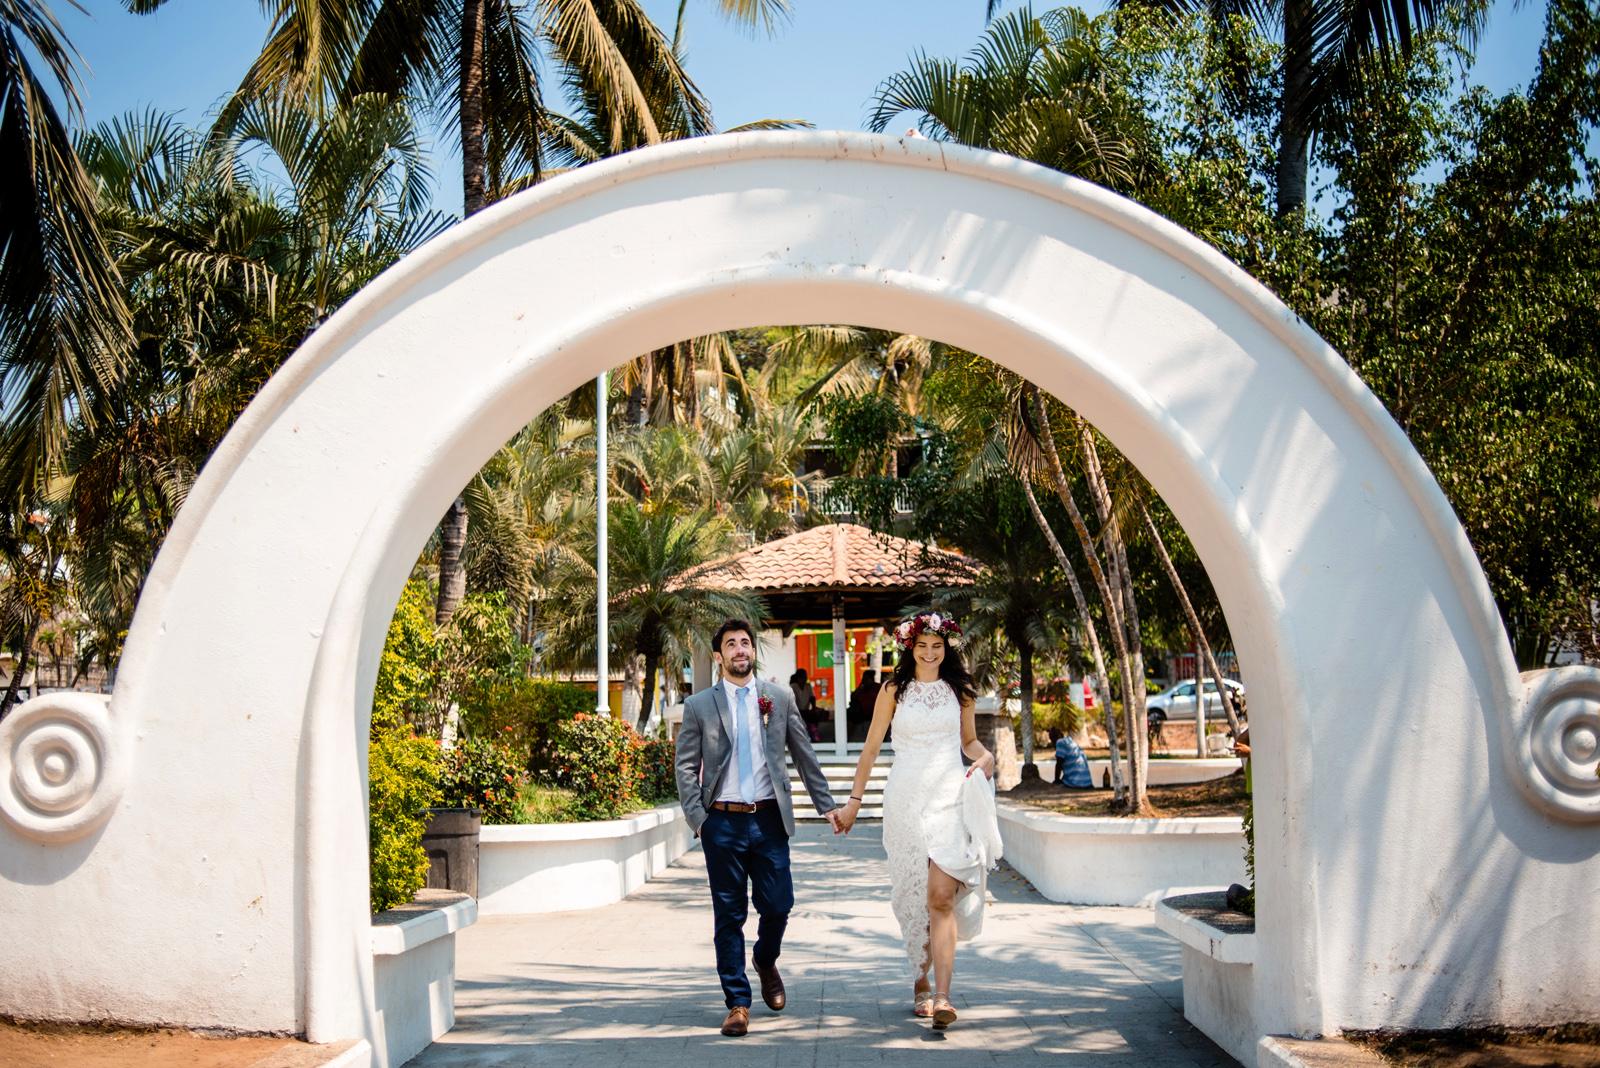 Villa-amor-sayulita-destination-wedding-mexico-021